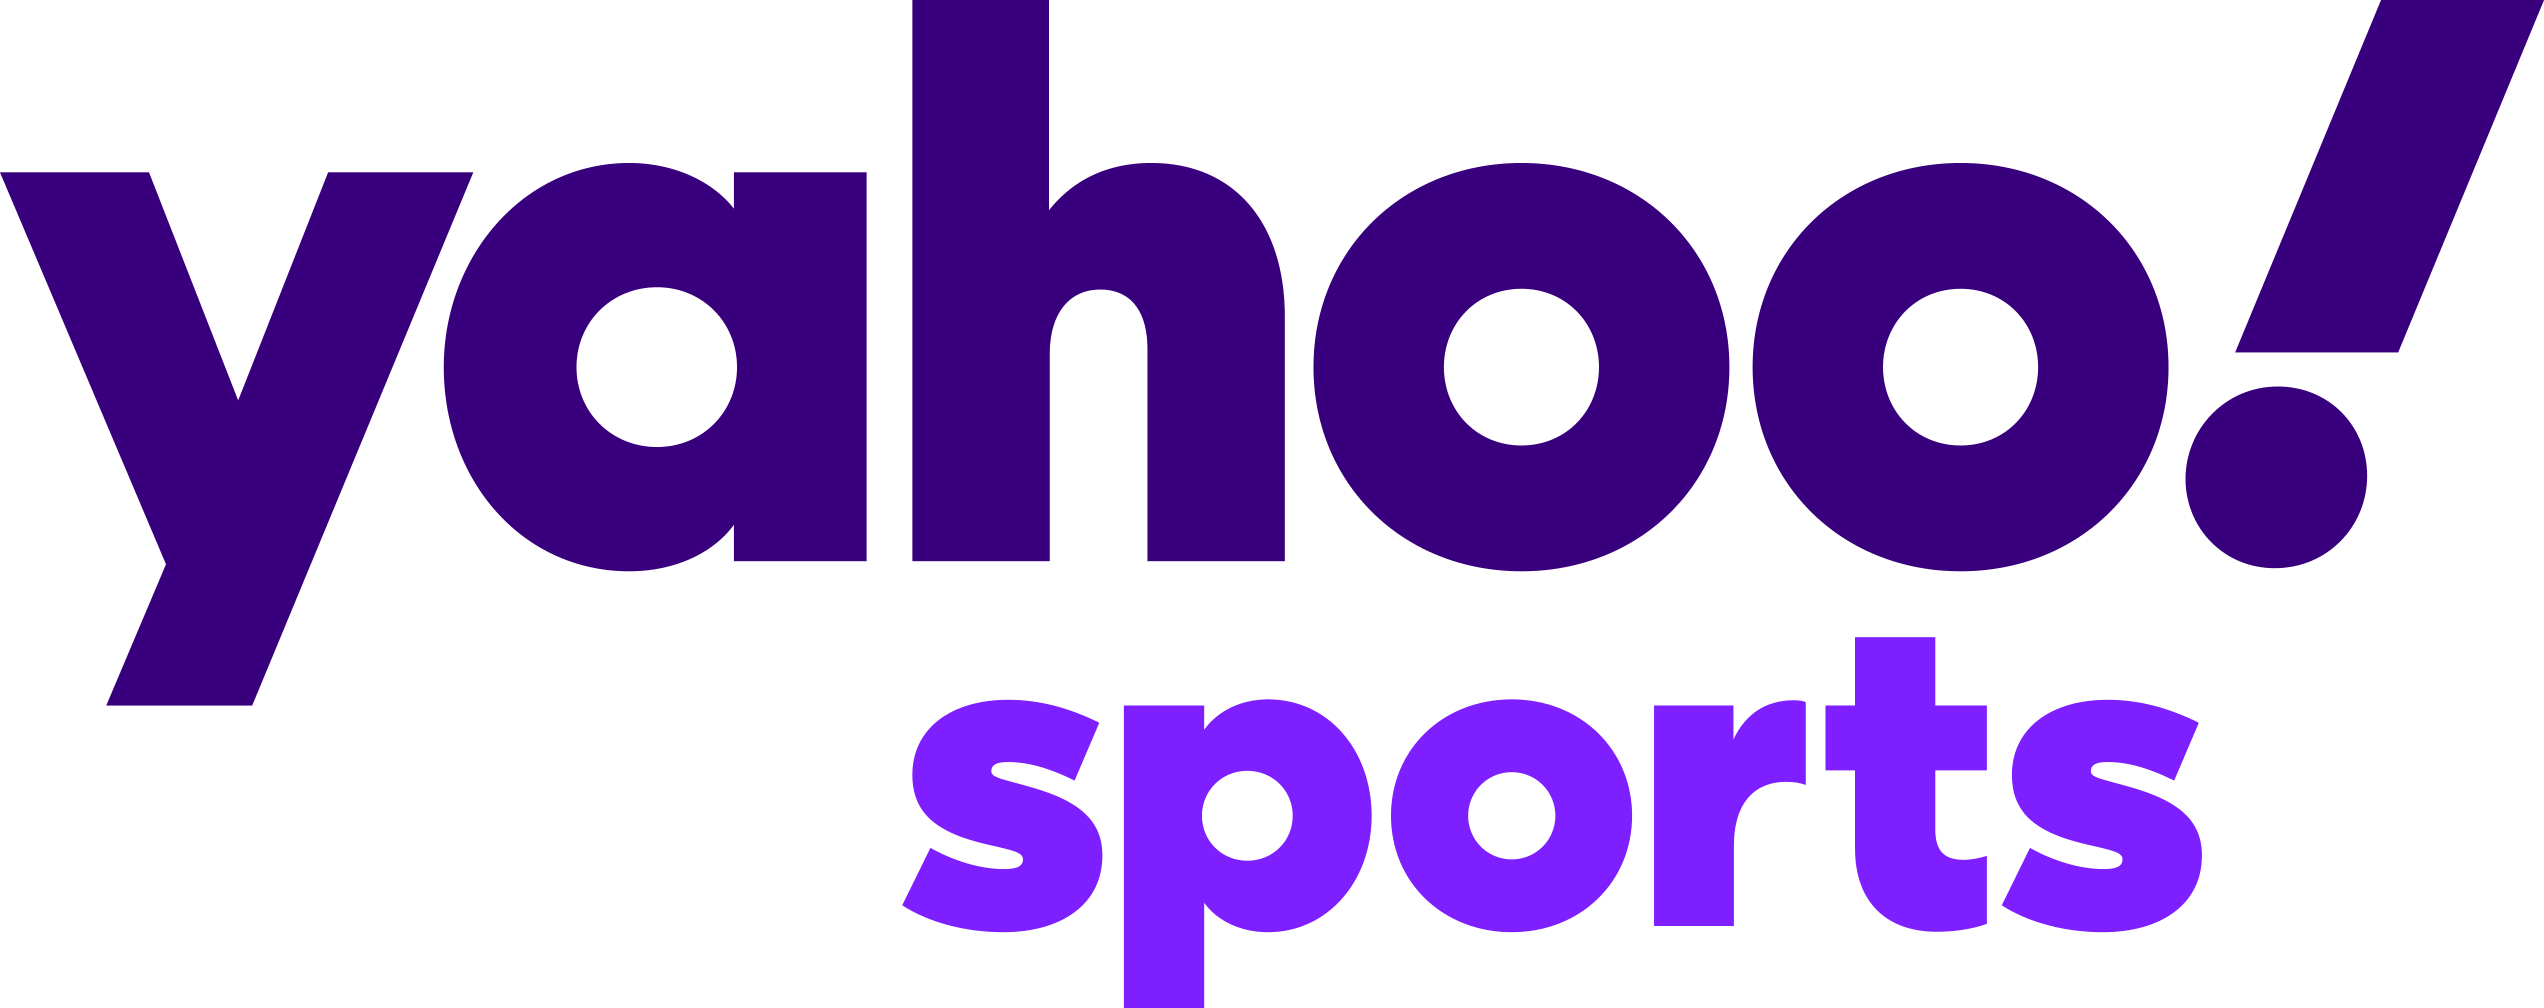 Yahoo Fantasy DFS Logo